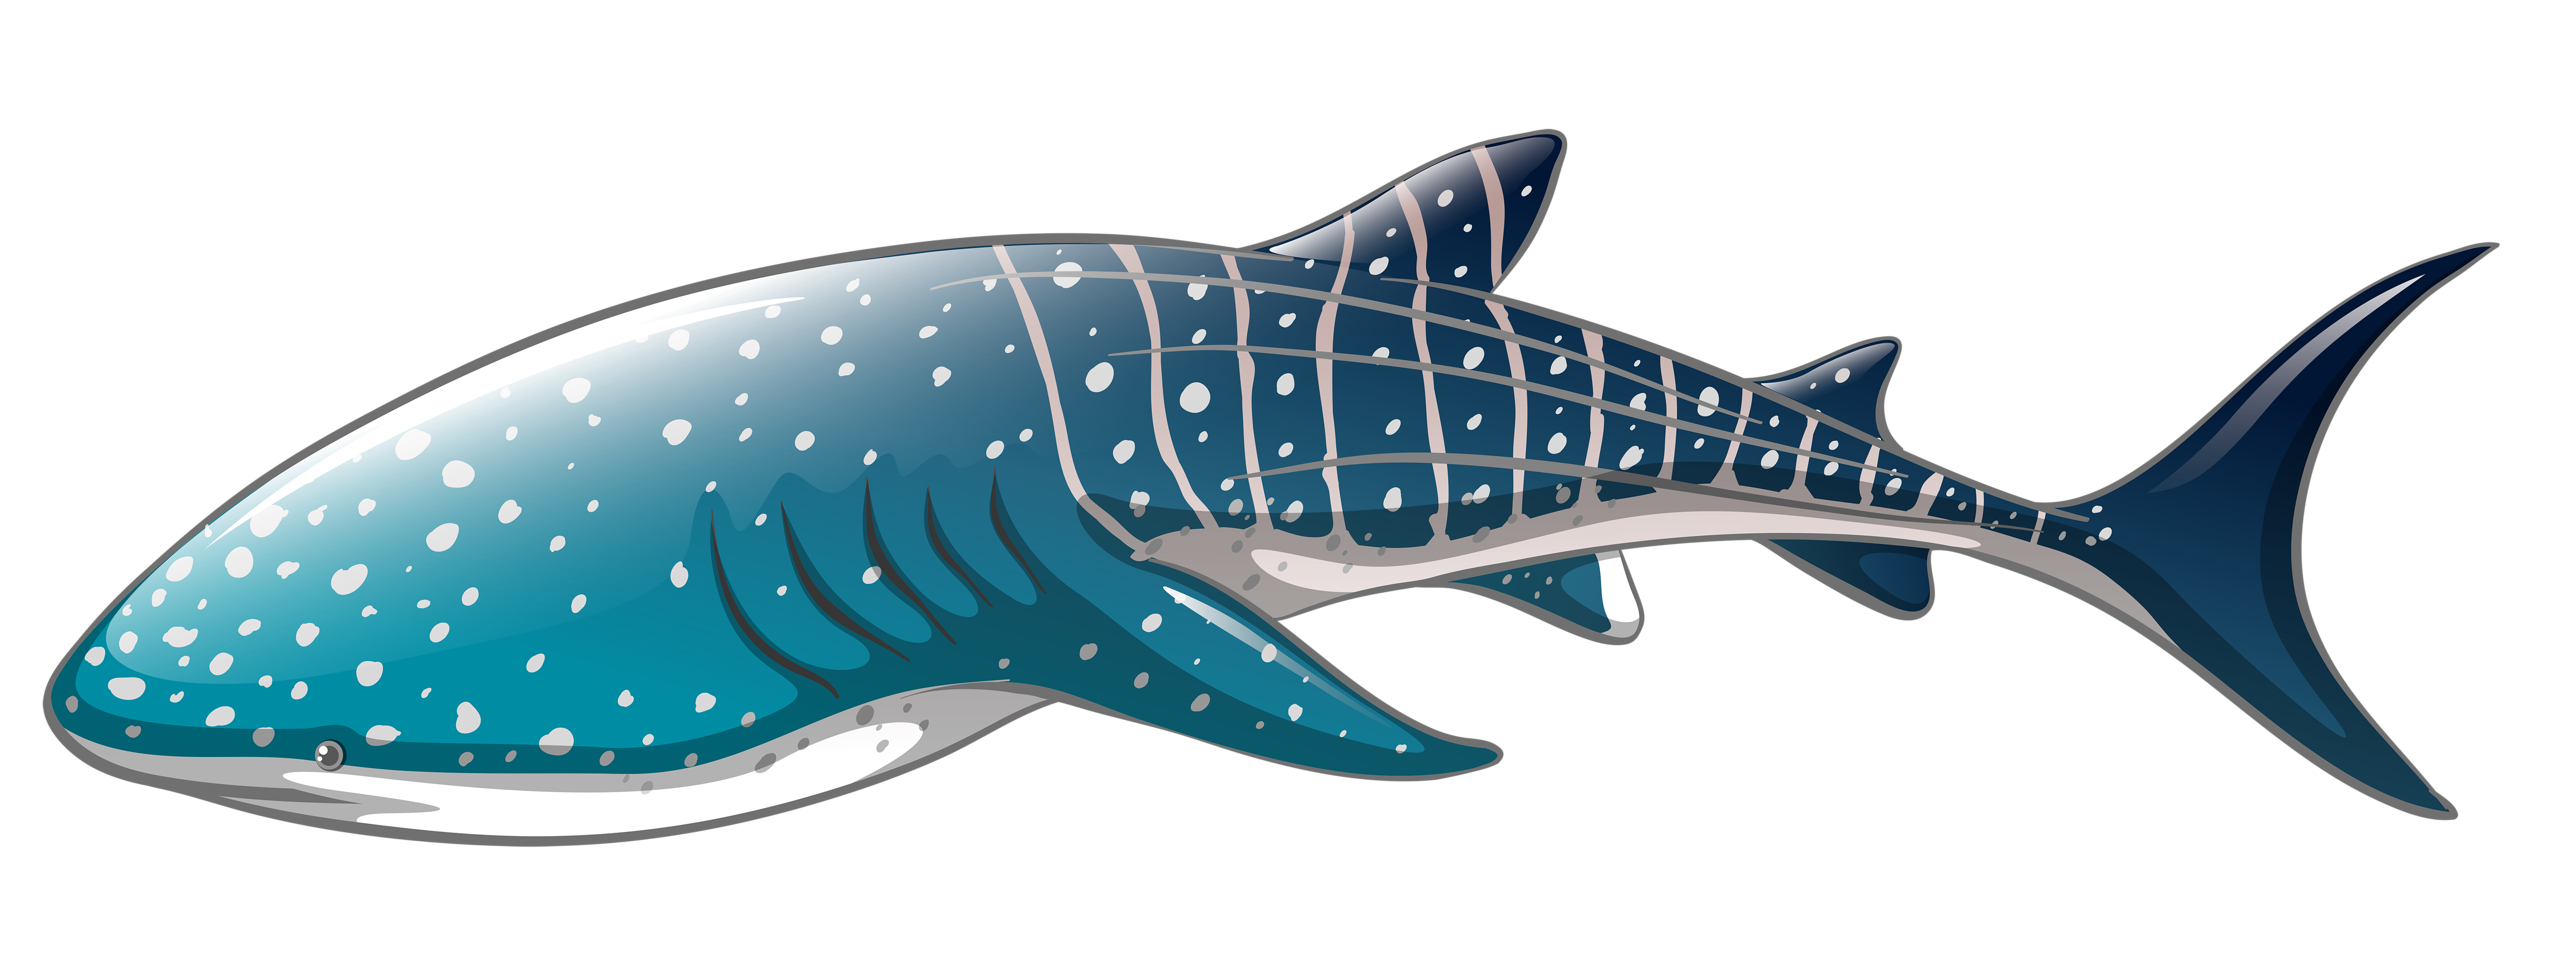 Fish underwater clipart graphic stock 2.png | Album graphic stock